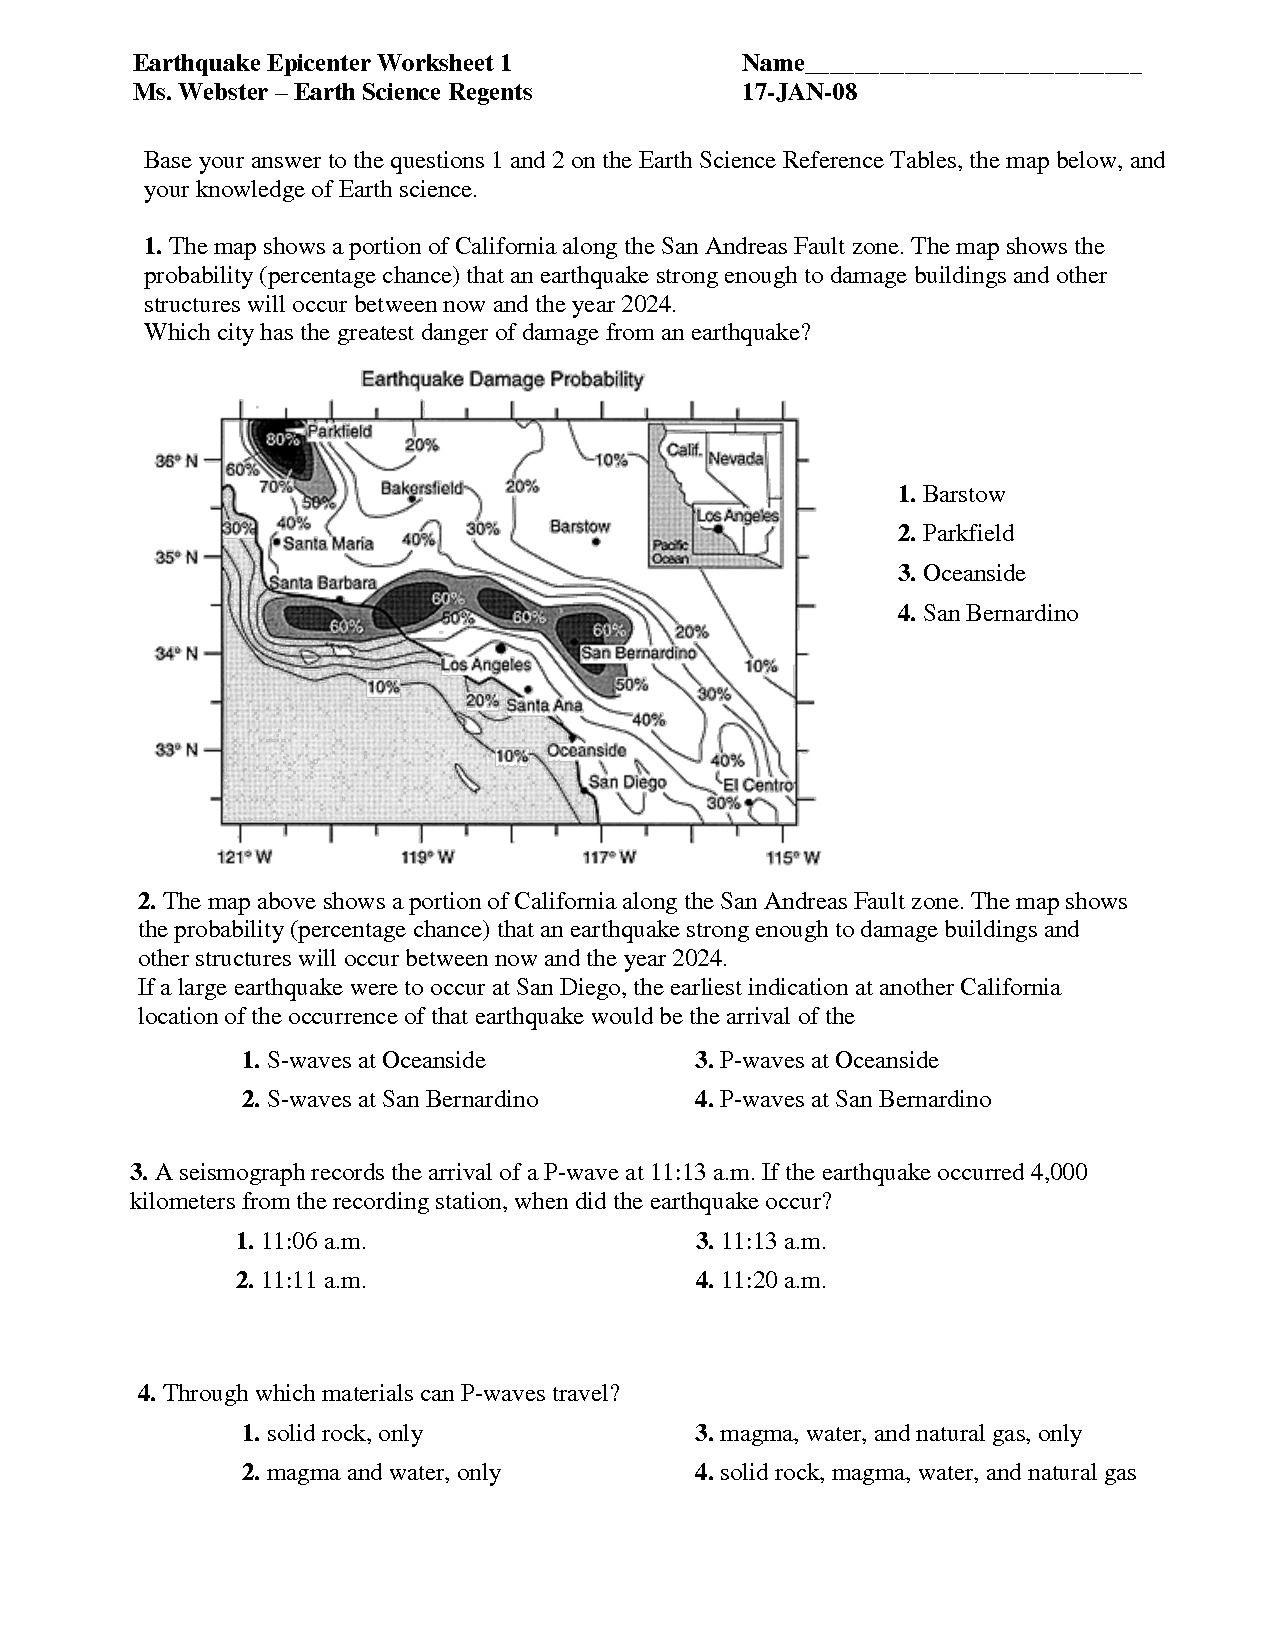 Cryptic Quiz Math Worksheet Answers